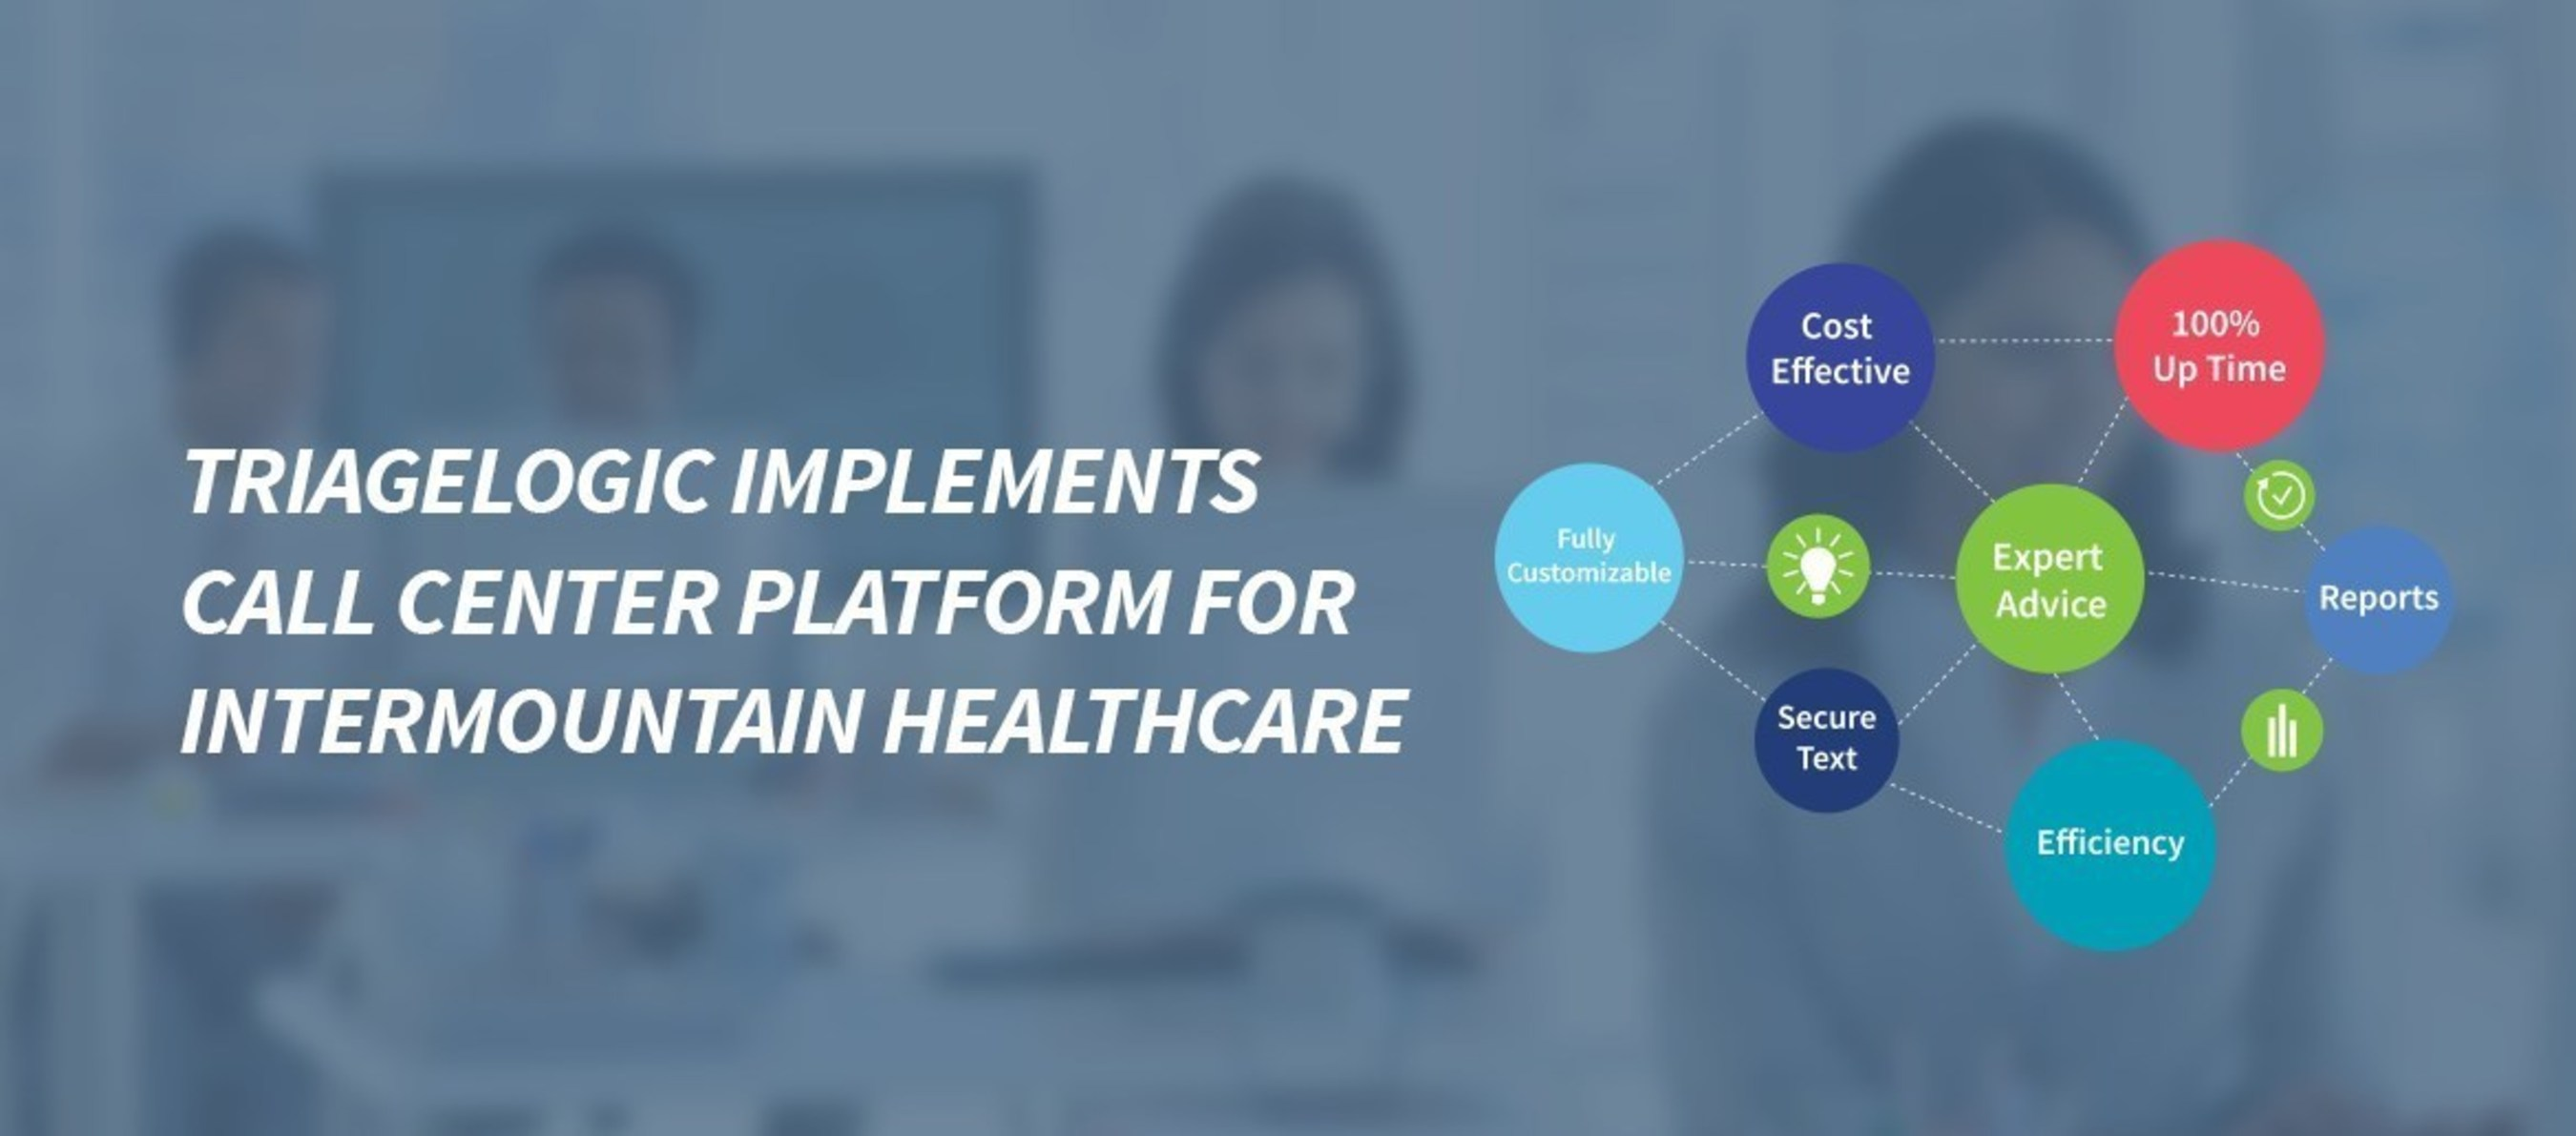 TriageLogic ' Implements Call Center Platform for Intermountain Healthcare